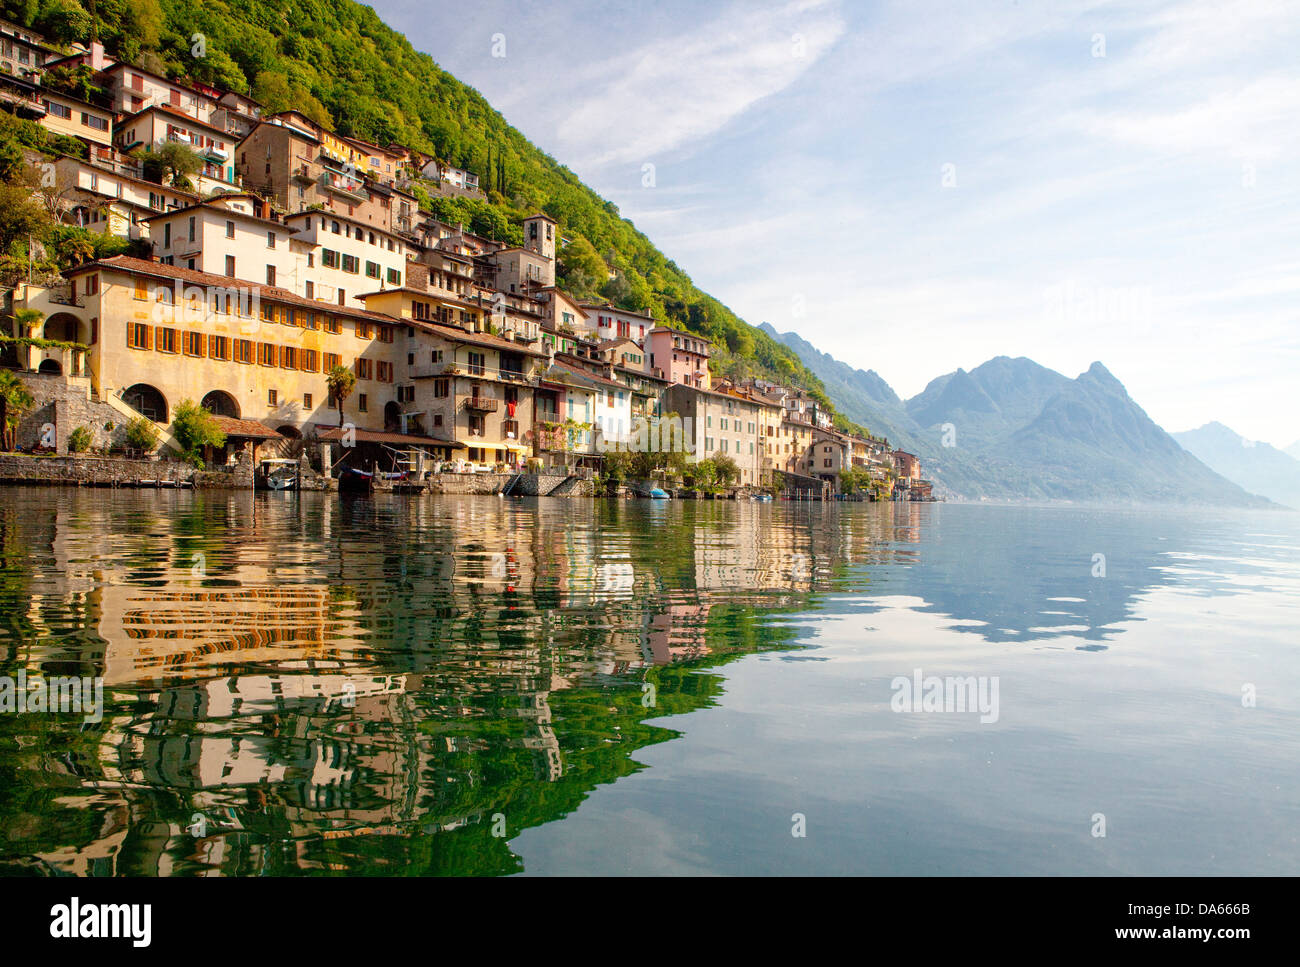 Gandria, Kanton, TI, Ticino, Südschweiz, Wasser, See, Seen, Dorf, Schweiz, Europa, Lago di Lugano, Stockbild